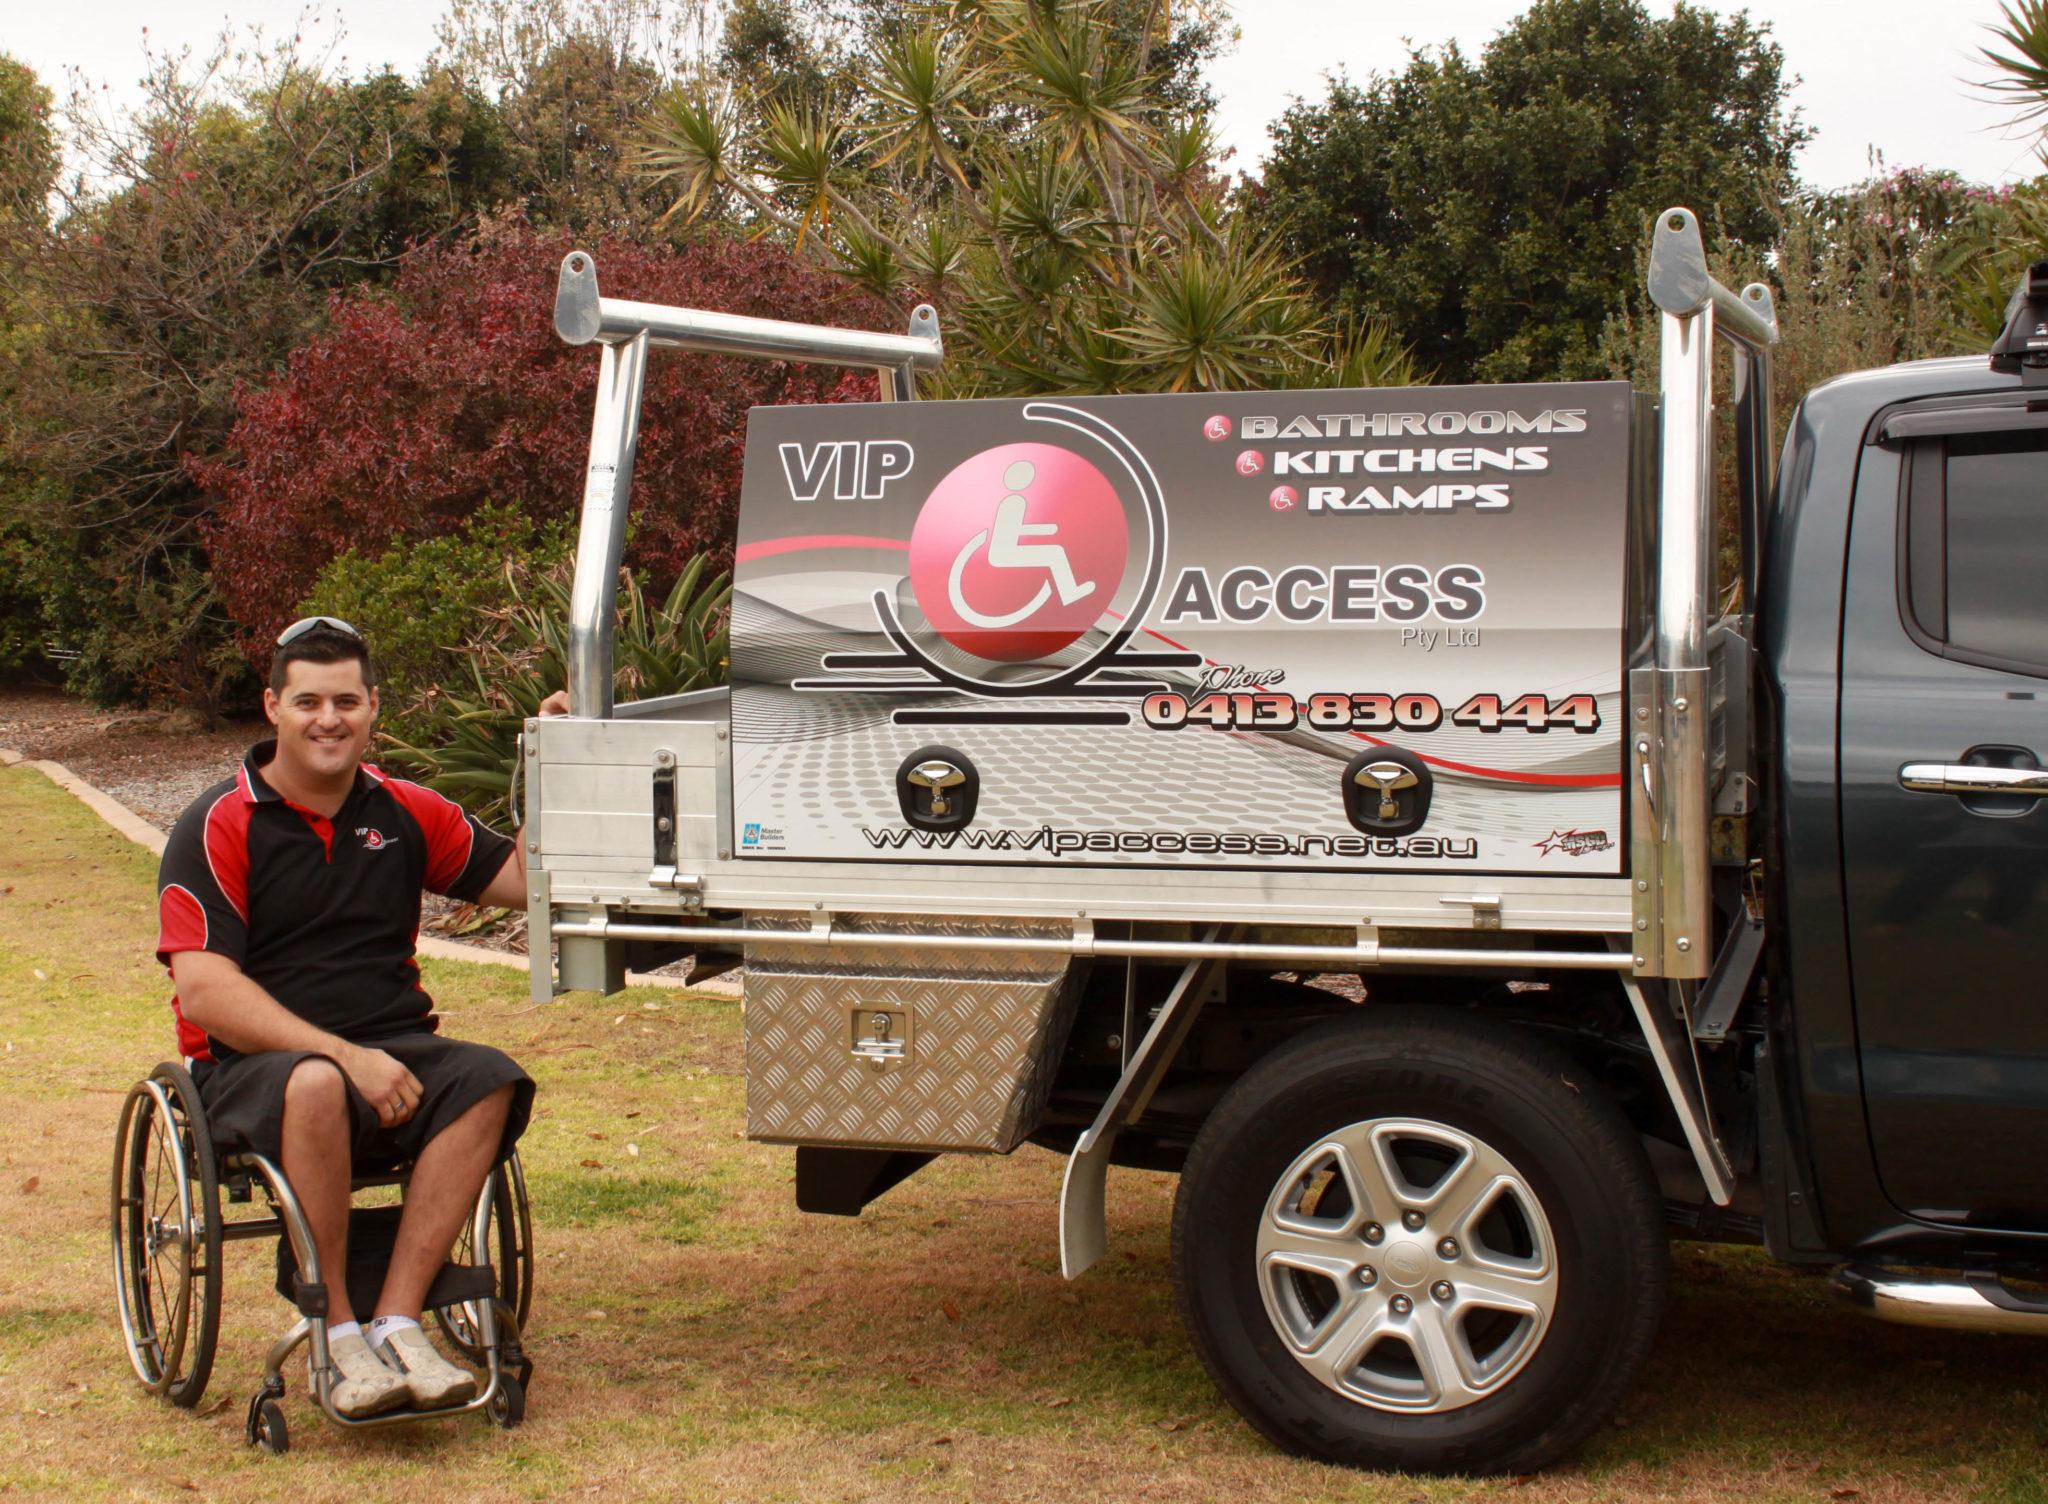 Scott Owner & Builder of VIP Access